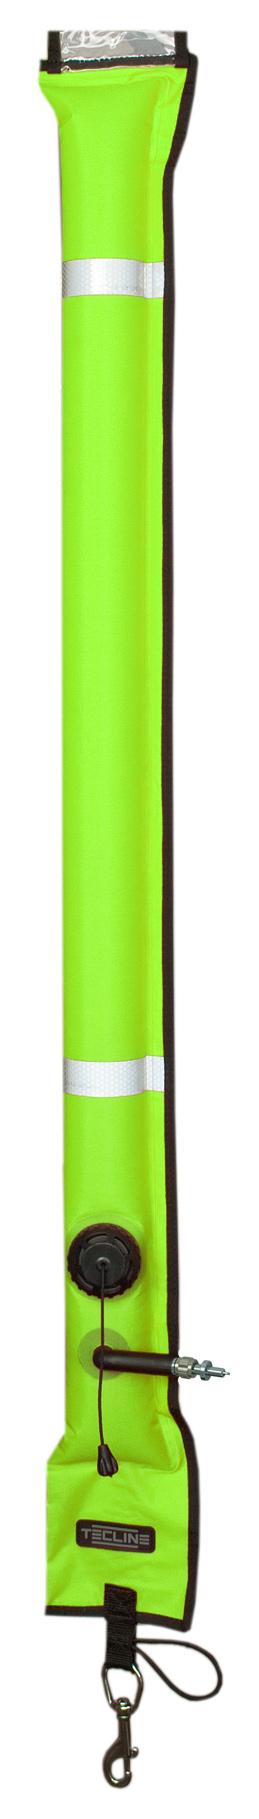 Boje, geschlossen, 11 x 117 cm, OPR-Ventil - Gelb [Tecline] 1